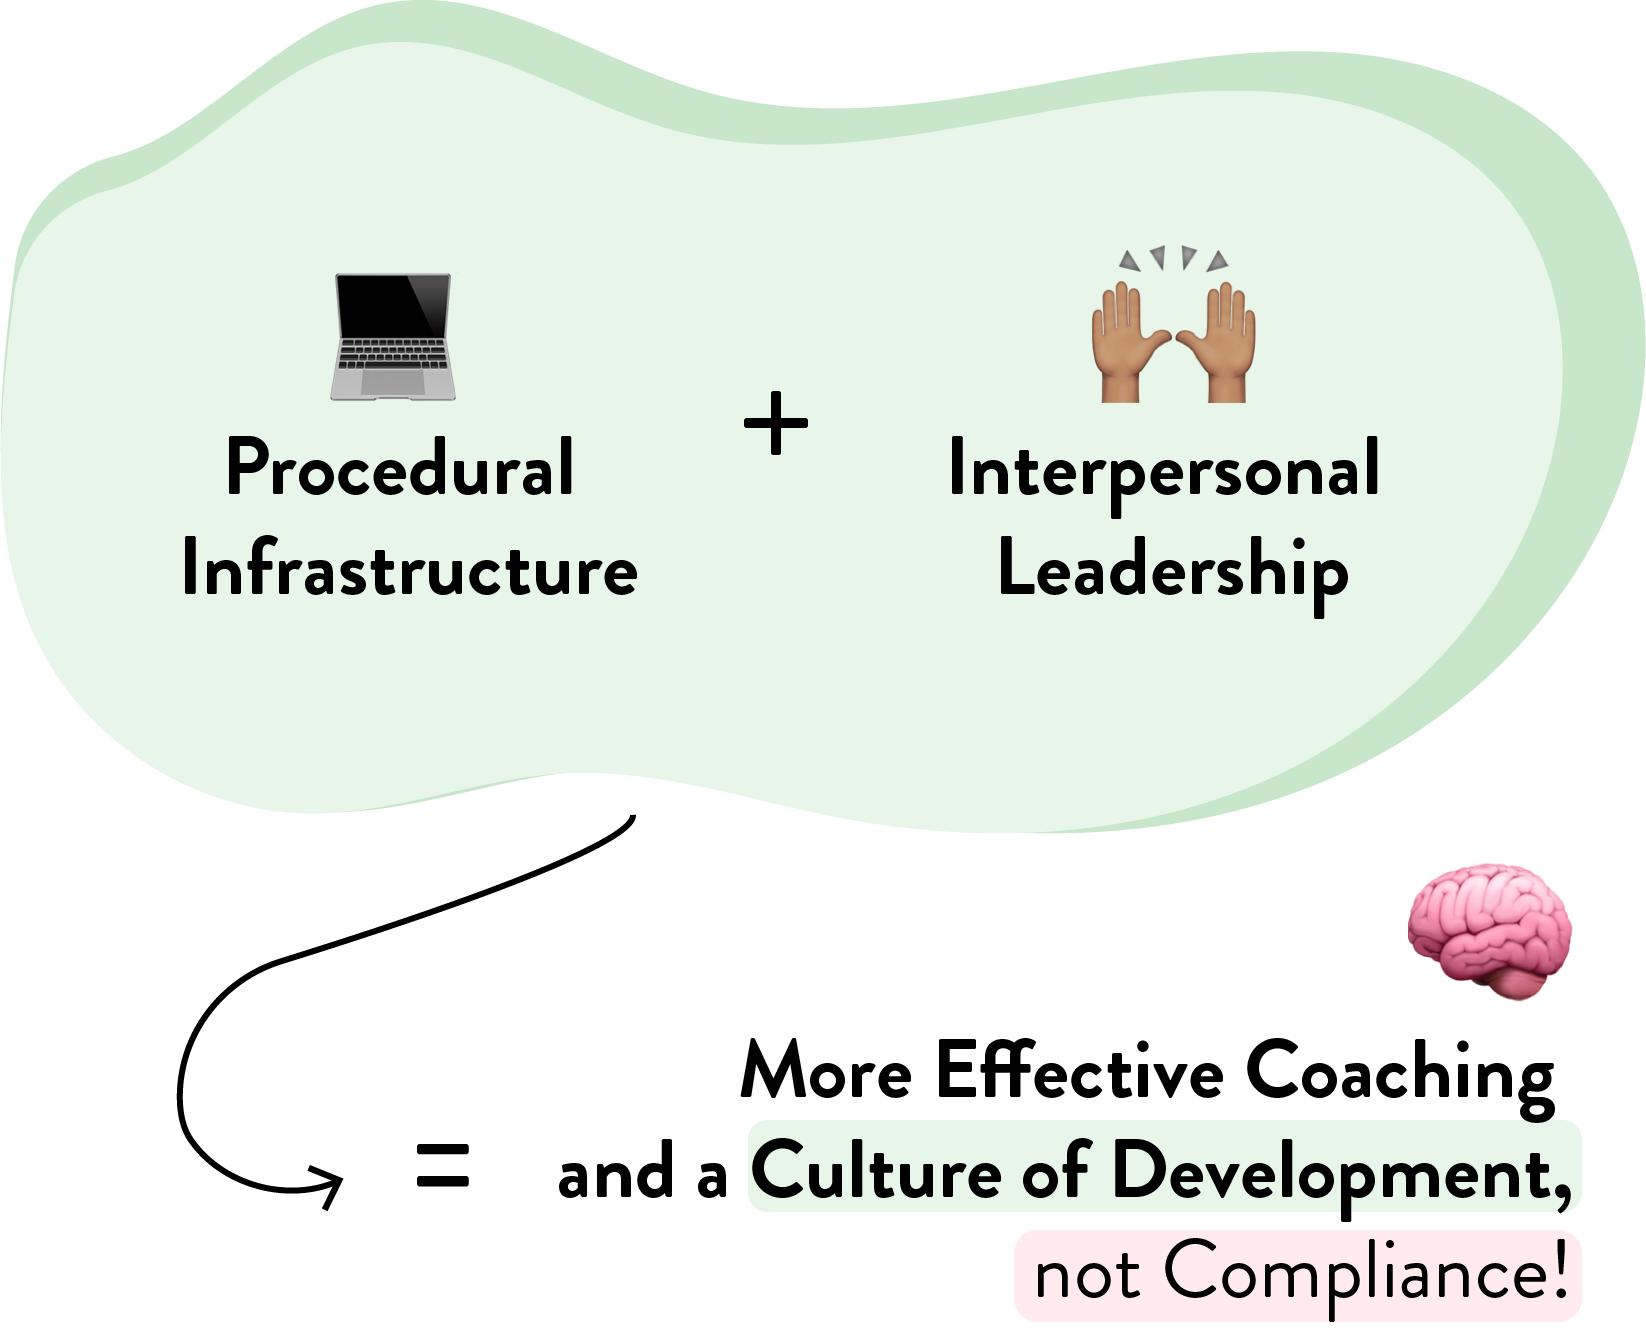 procedural infrastructure + interpersonal leadership graphic@2x